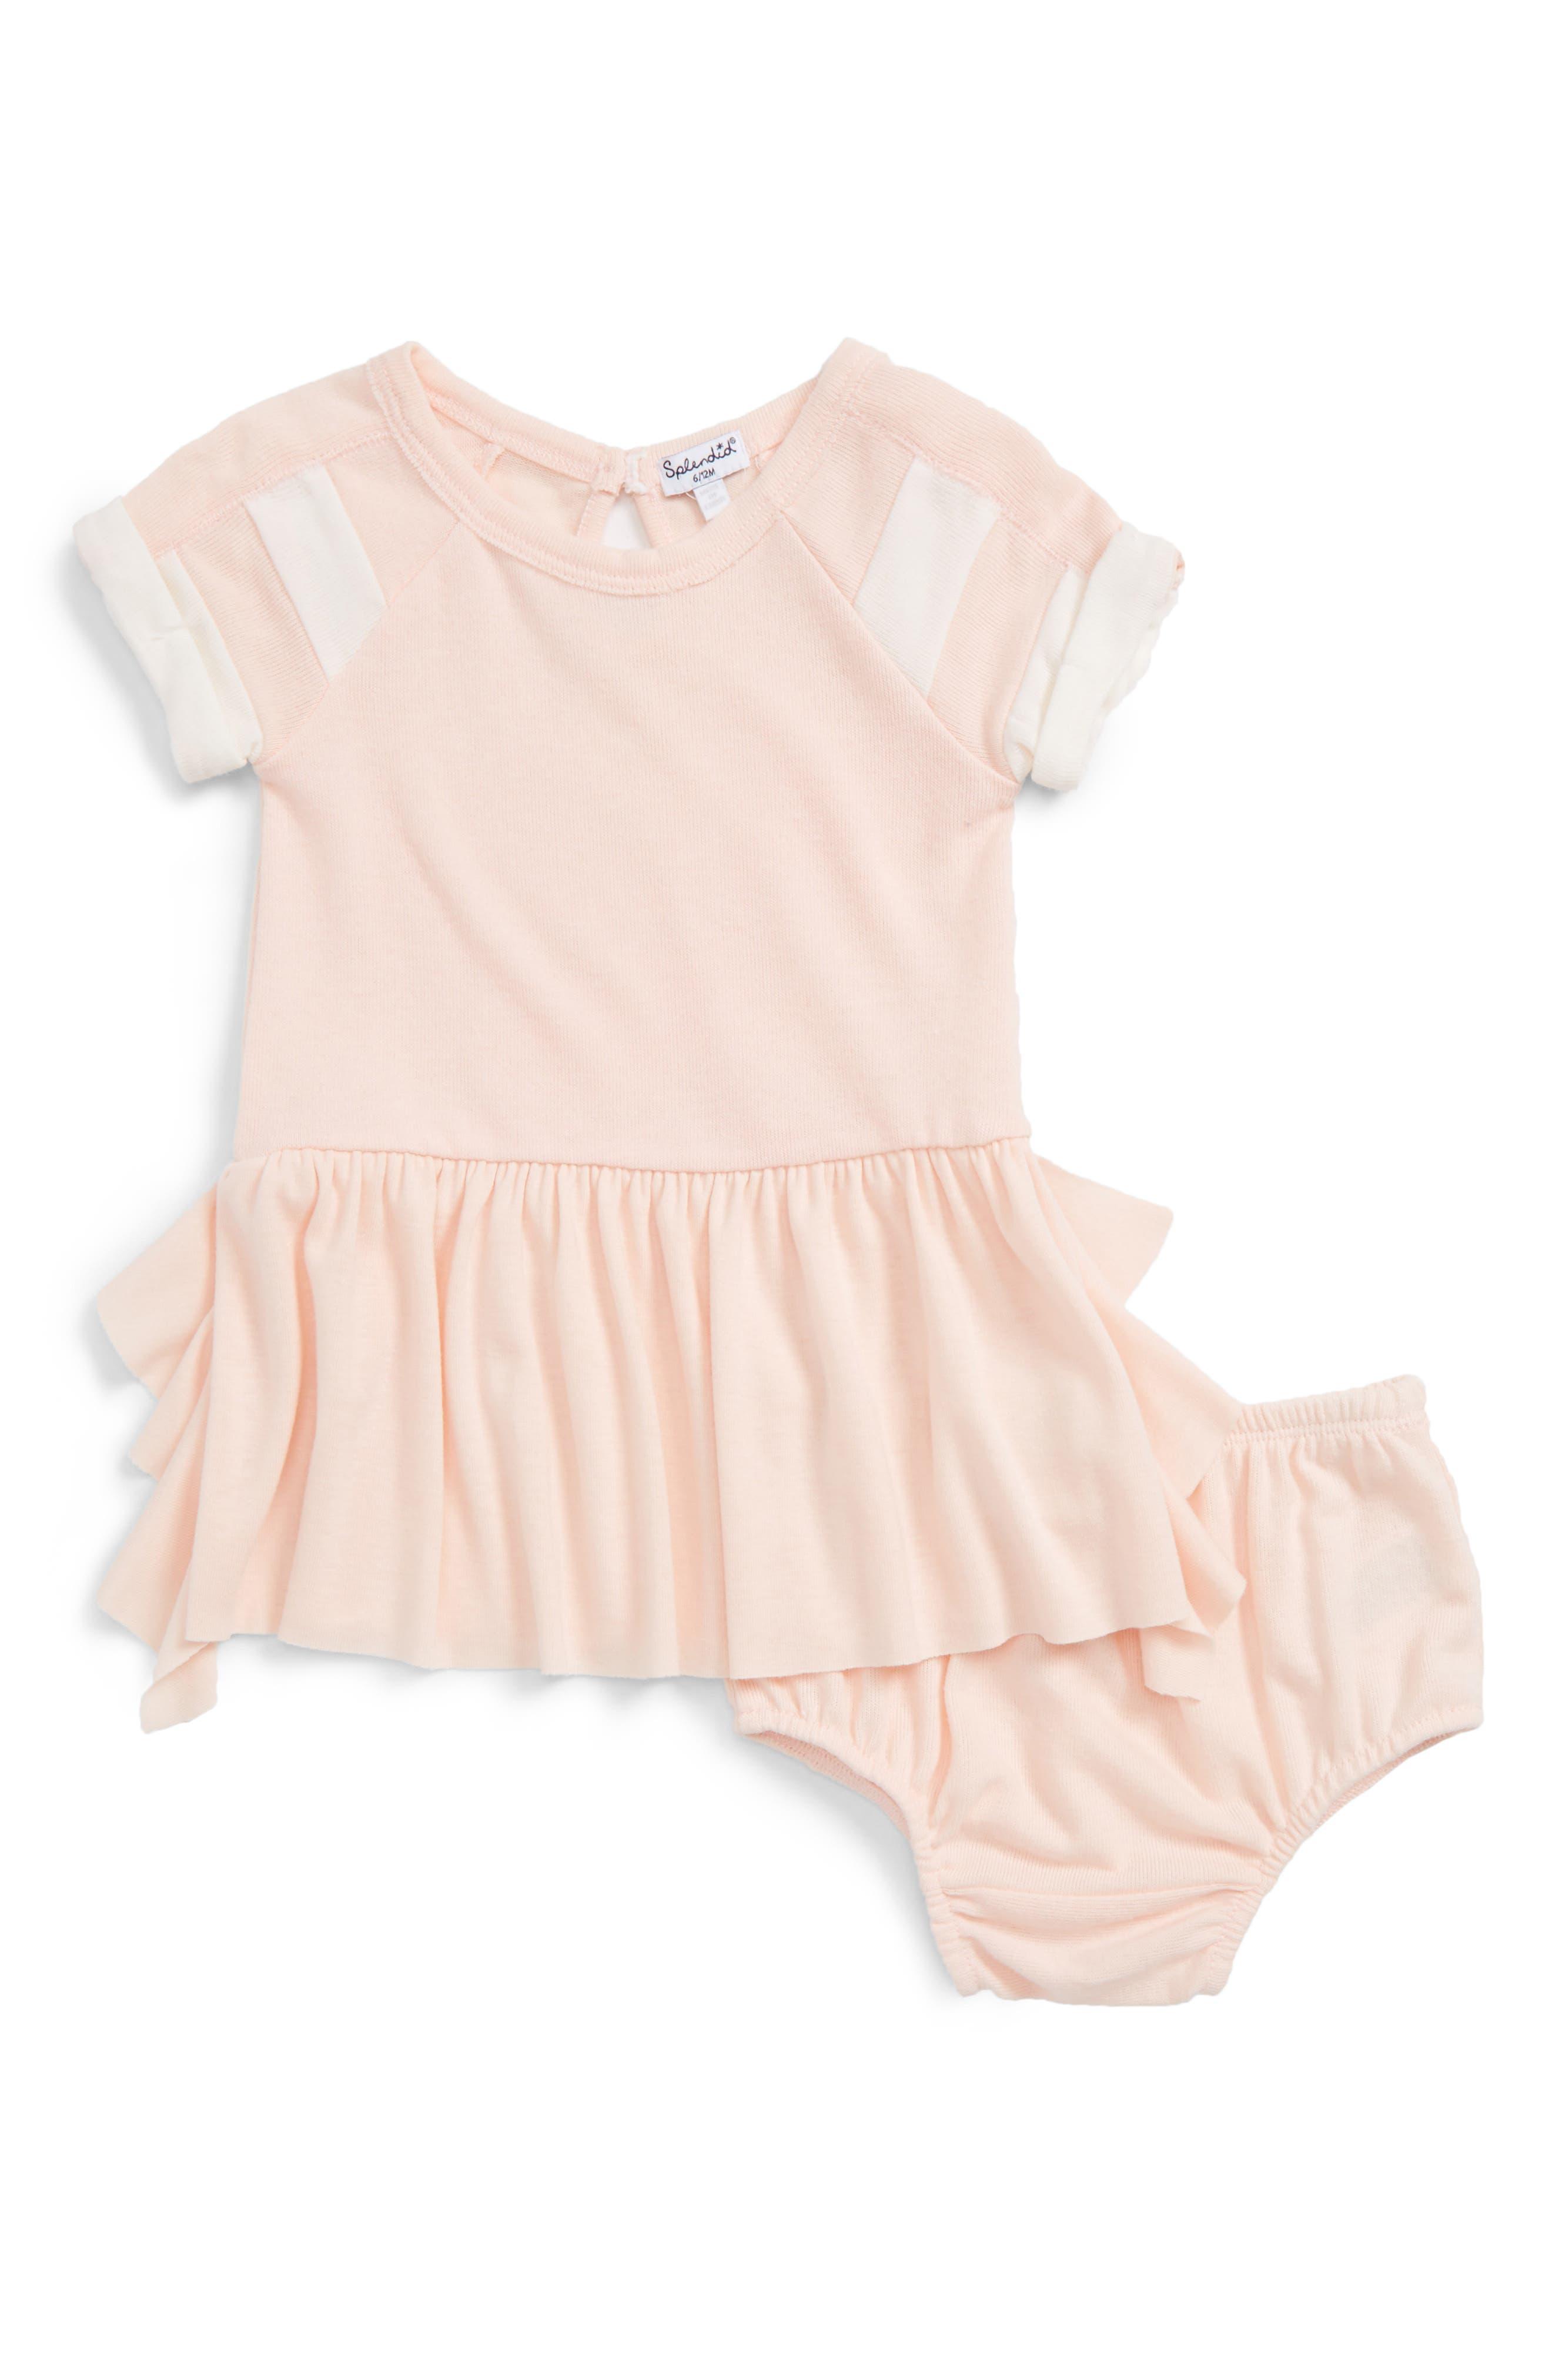 Main Image - Splendid Knit Dress (Baby Girls)